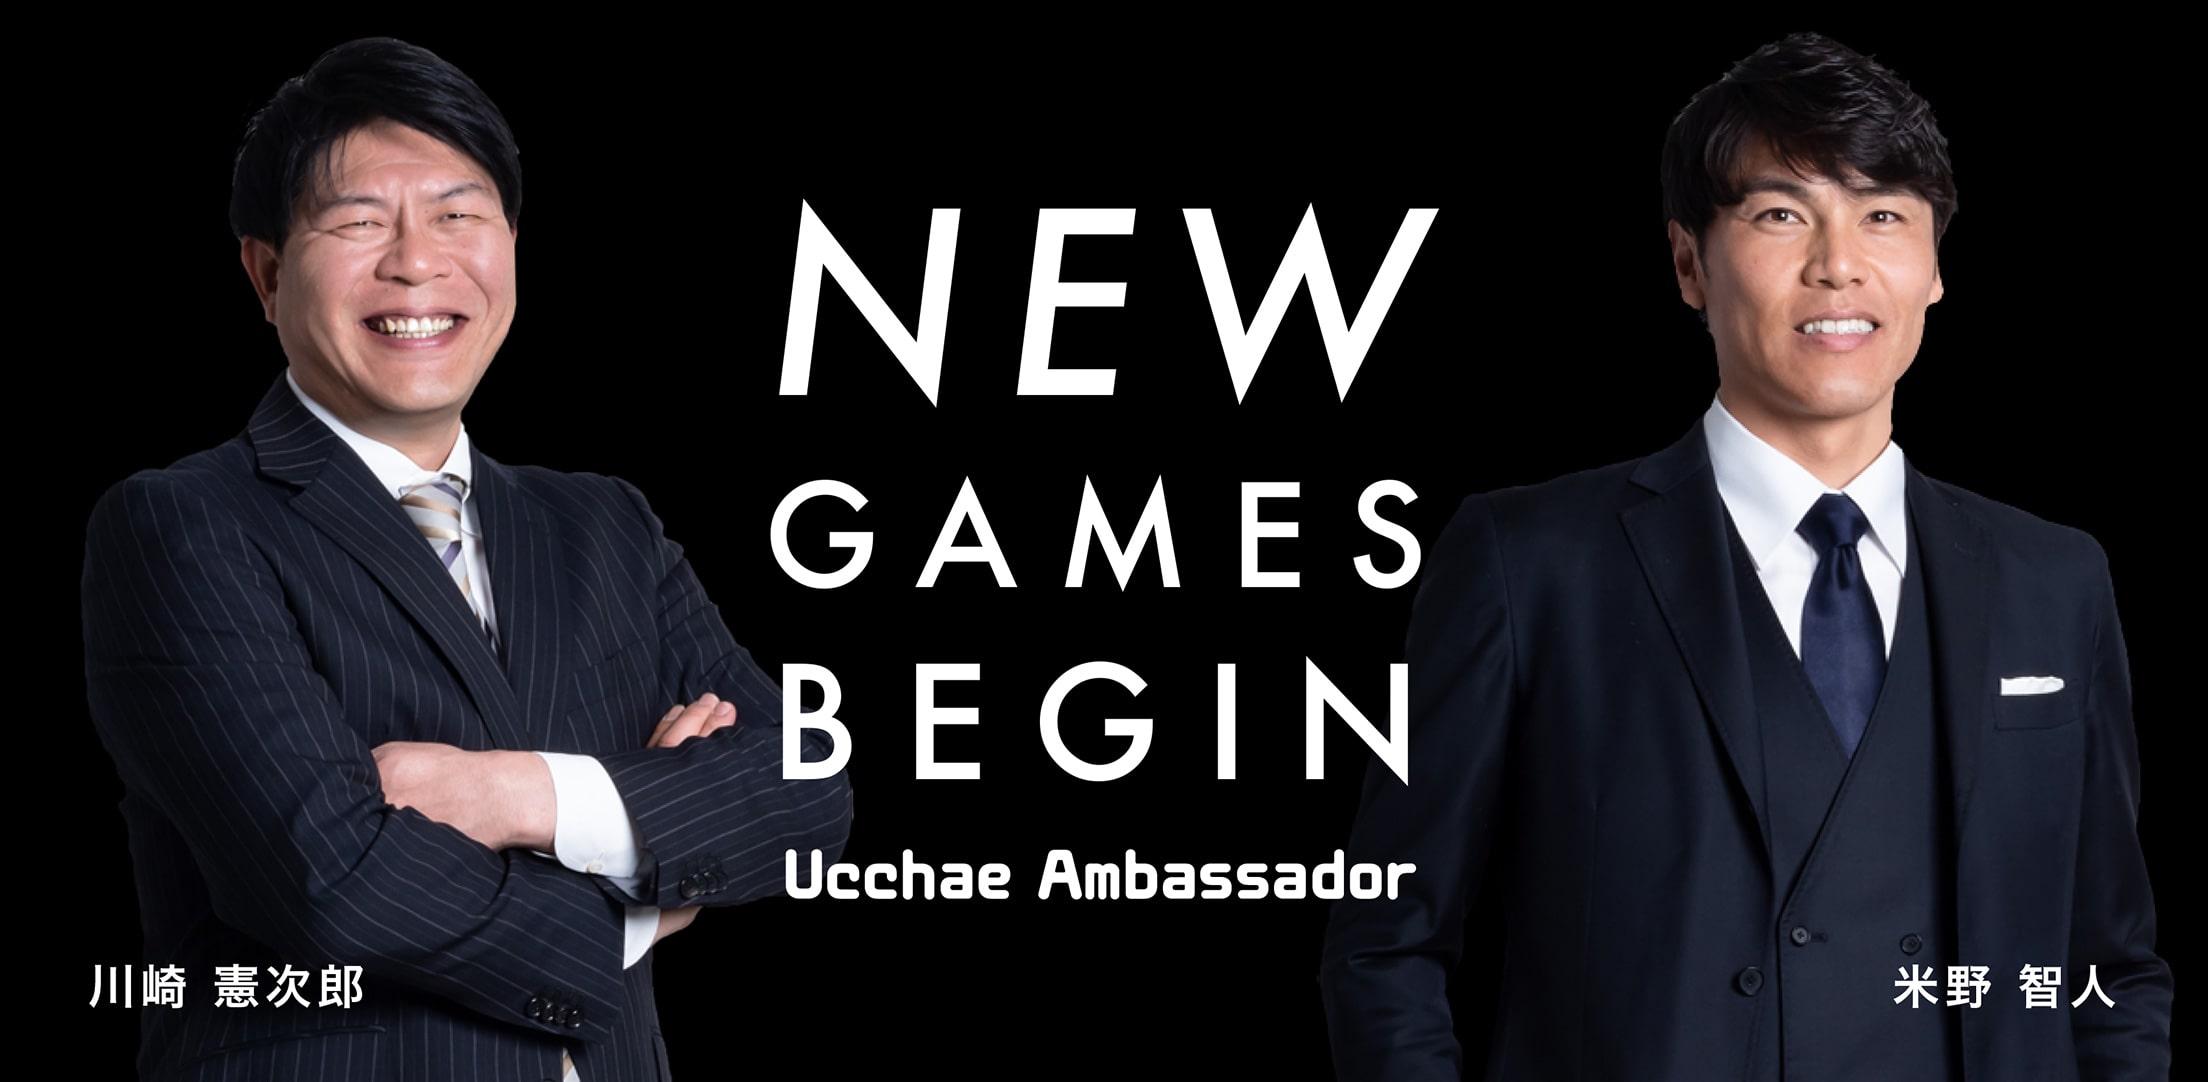 NEW GAMES BEGIN Ucchae Ambassador